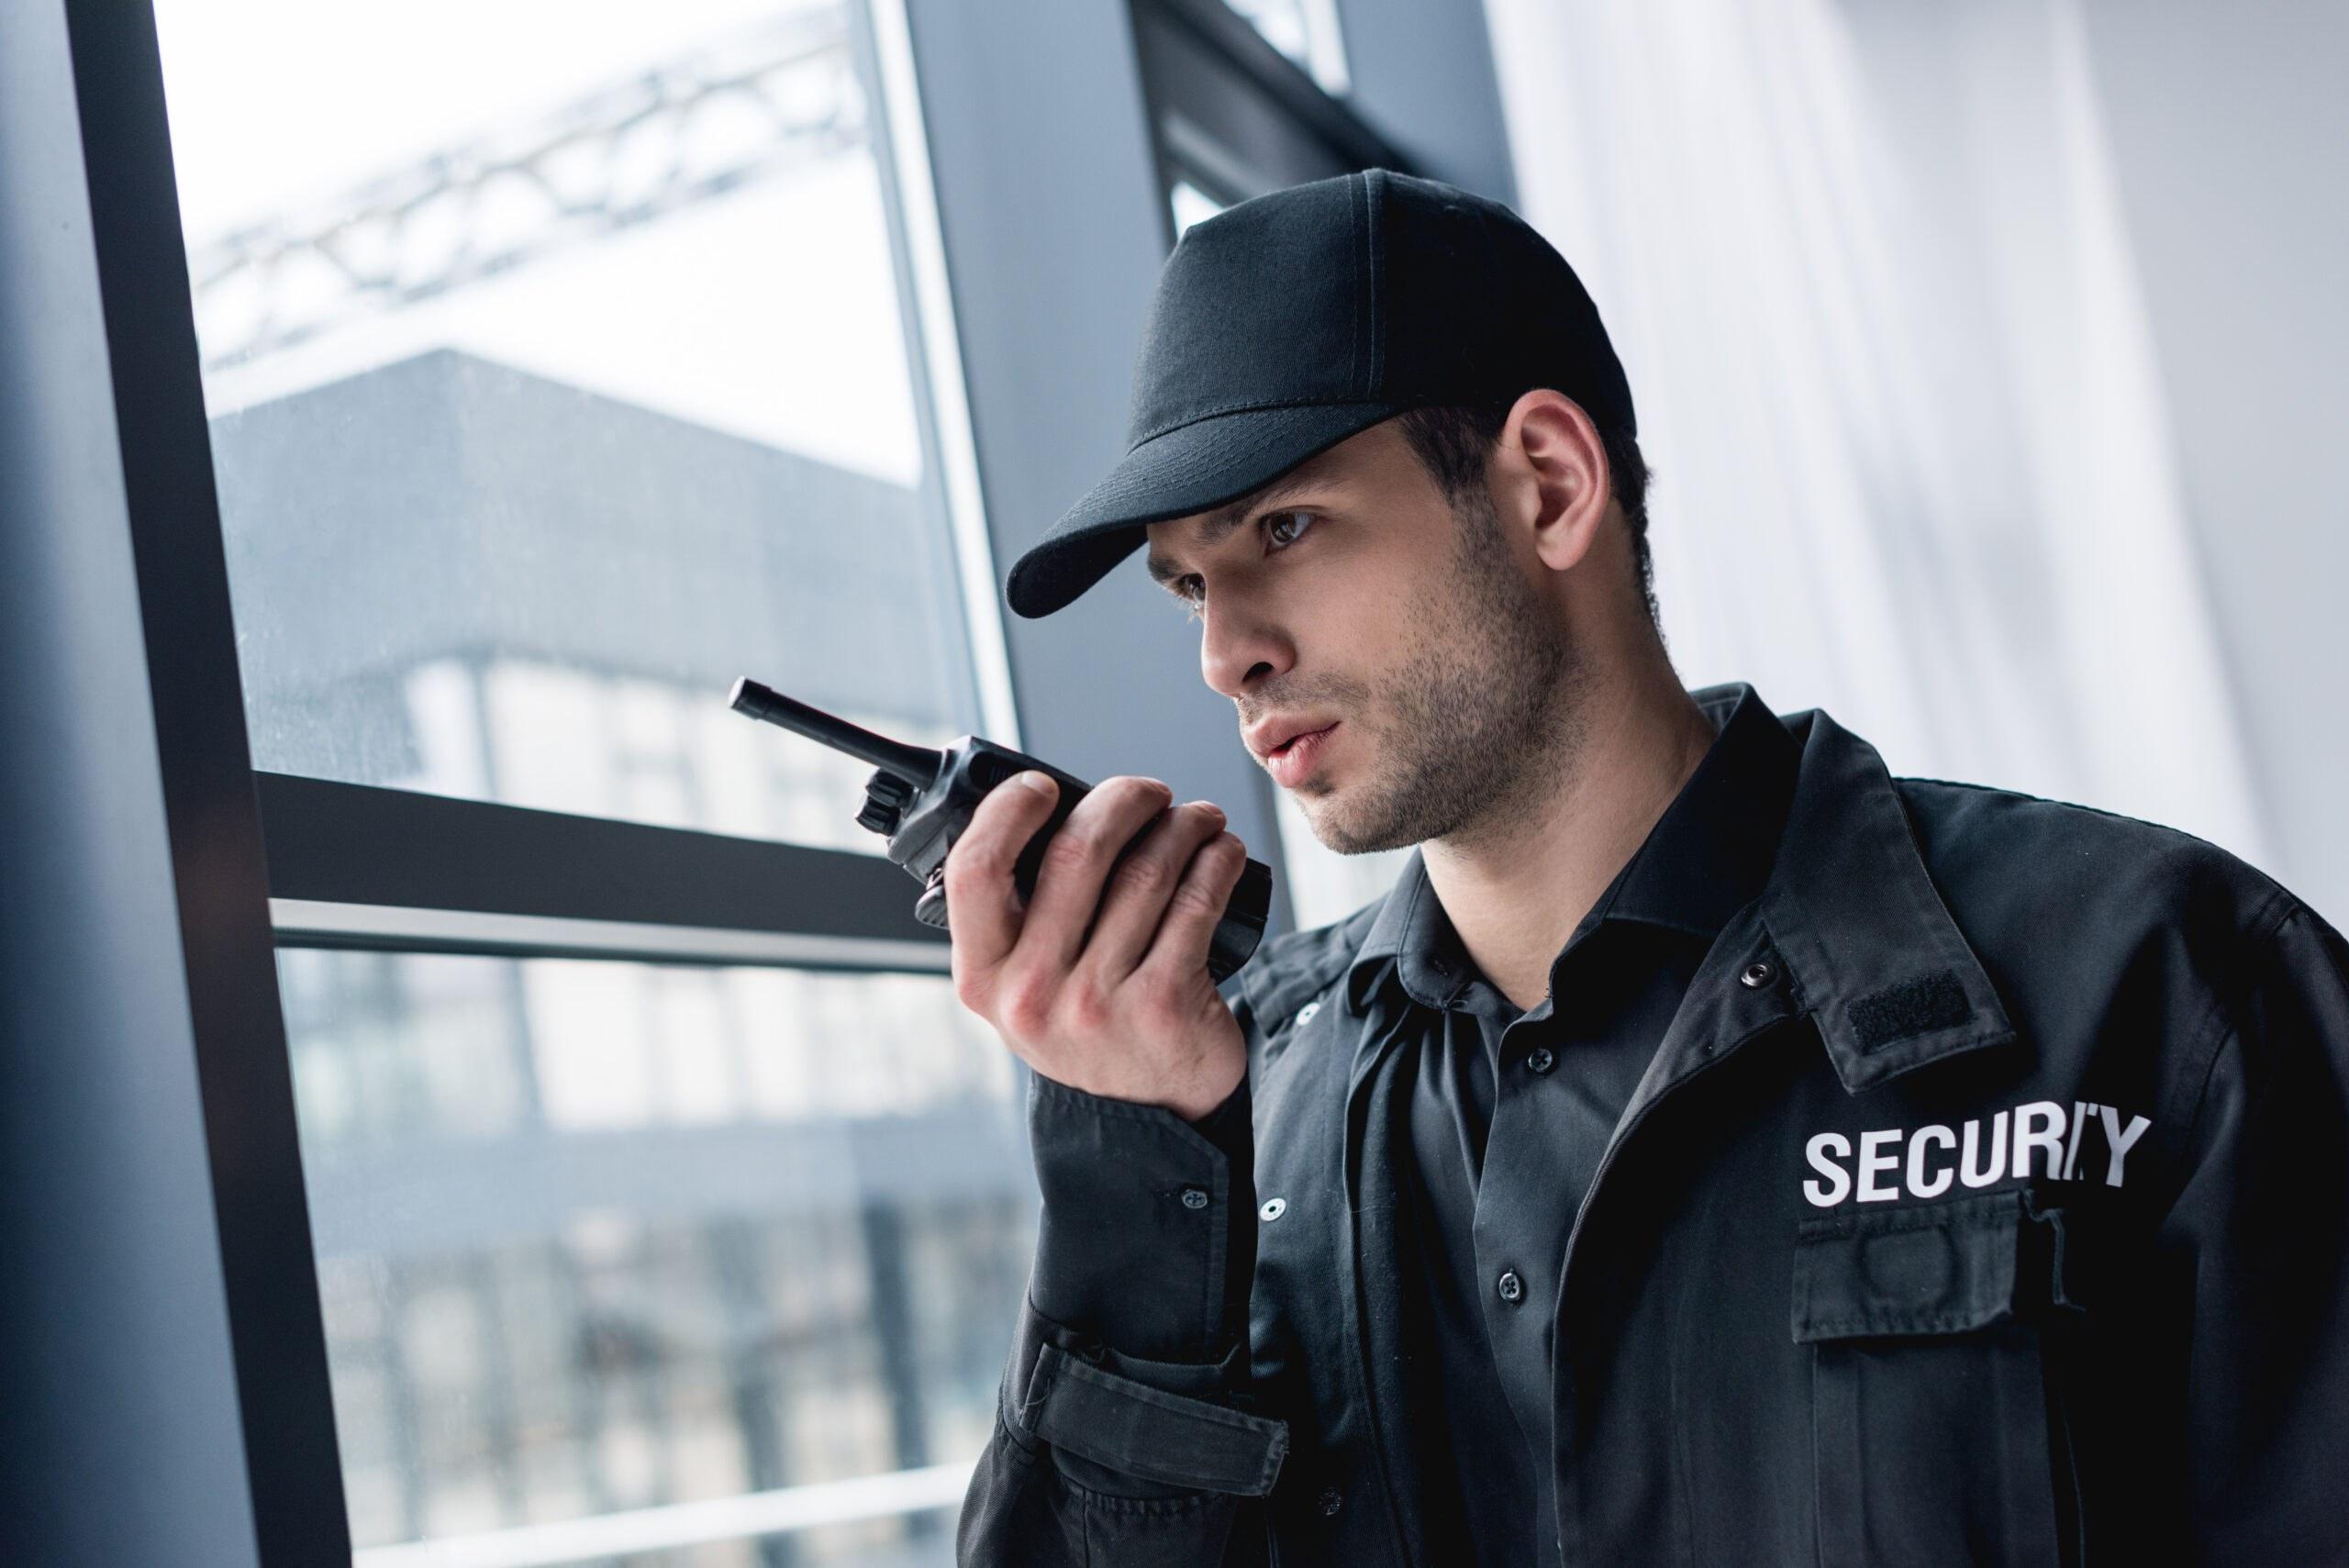 Schutz, Sicherheit Stuttgart, bewachung, Meldung, Dienst, Absicherung, Beschützen